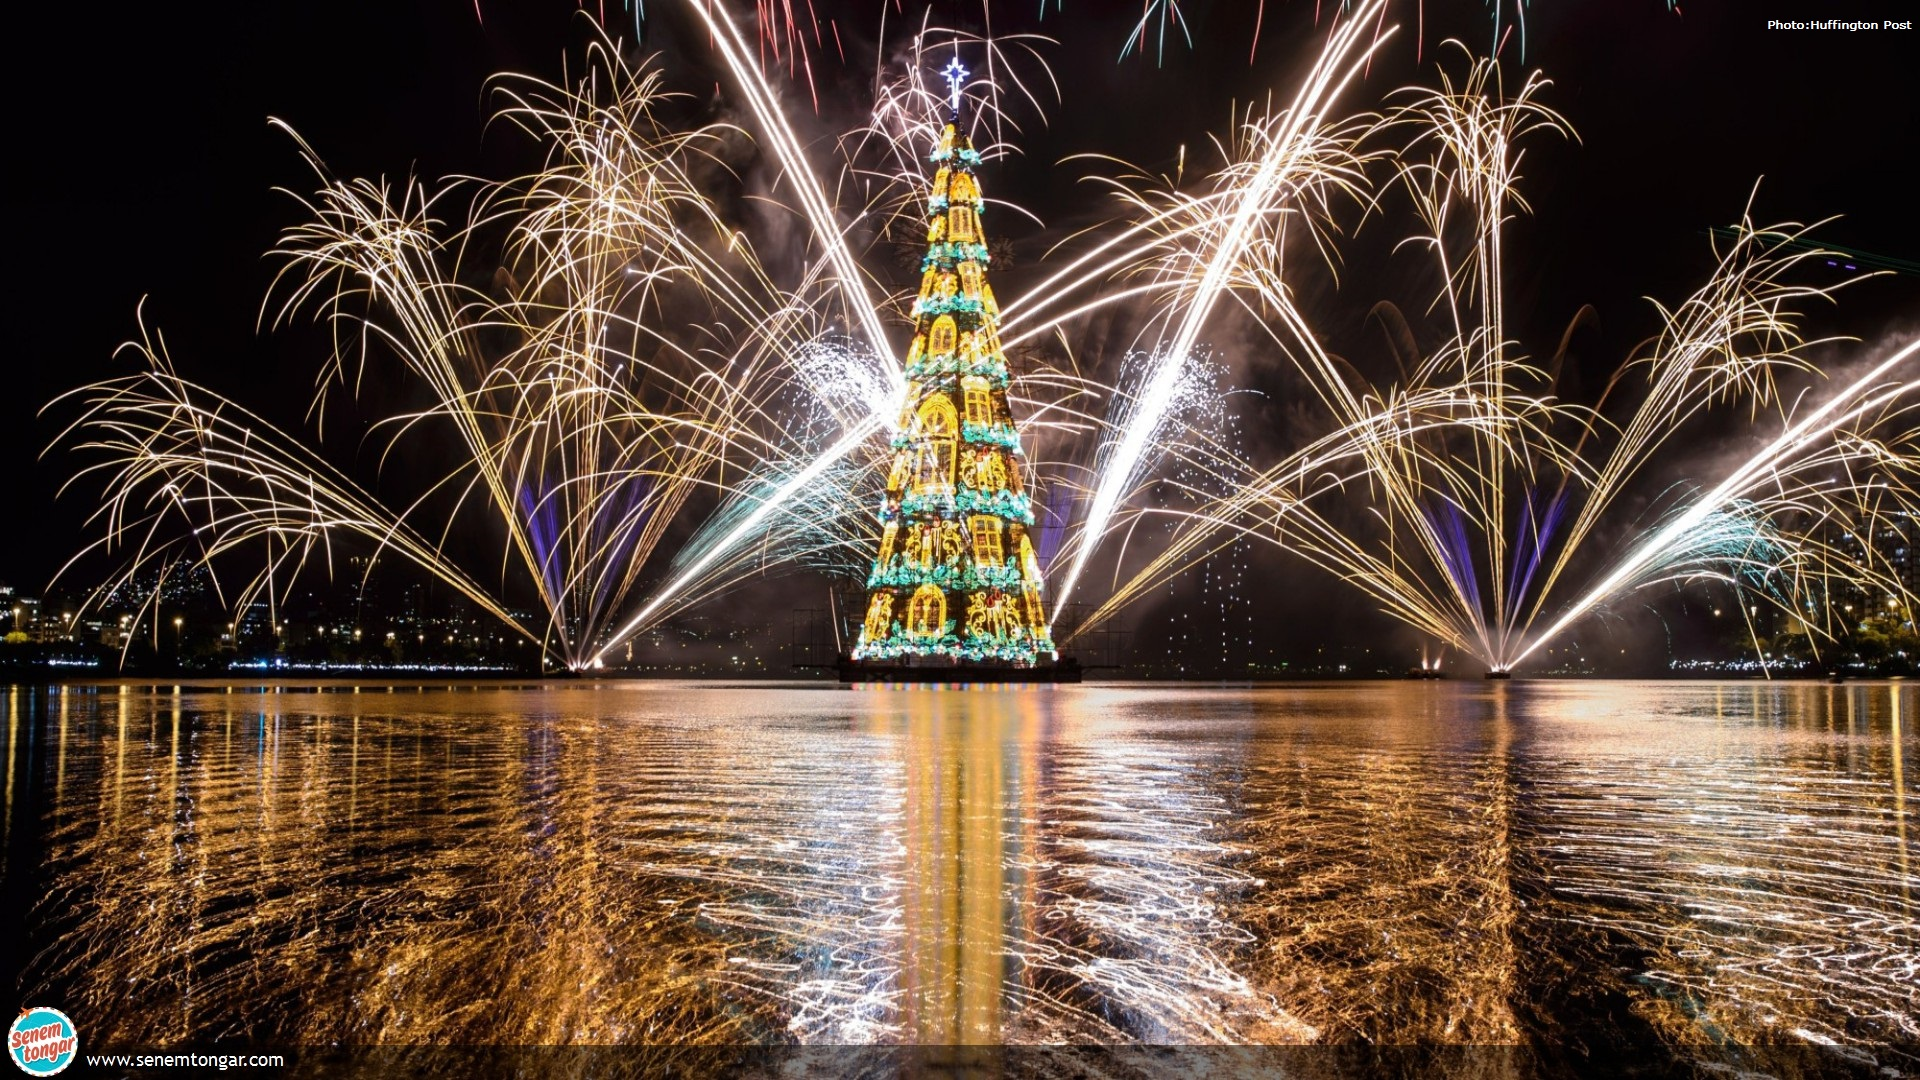 CHRISTMAS-TREE-huffigtonpost_rio